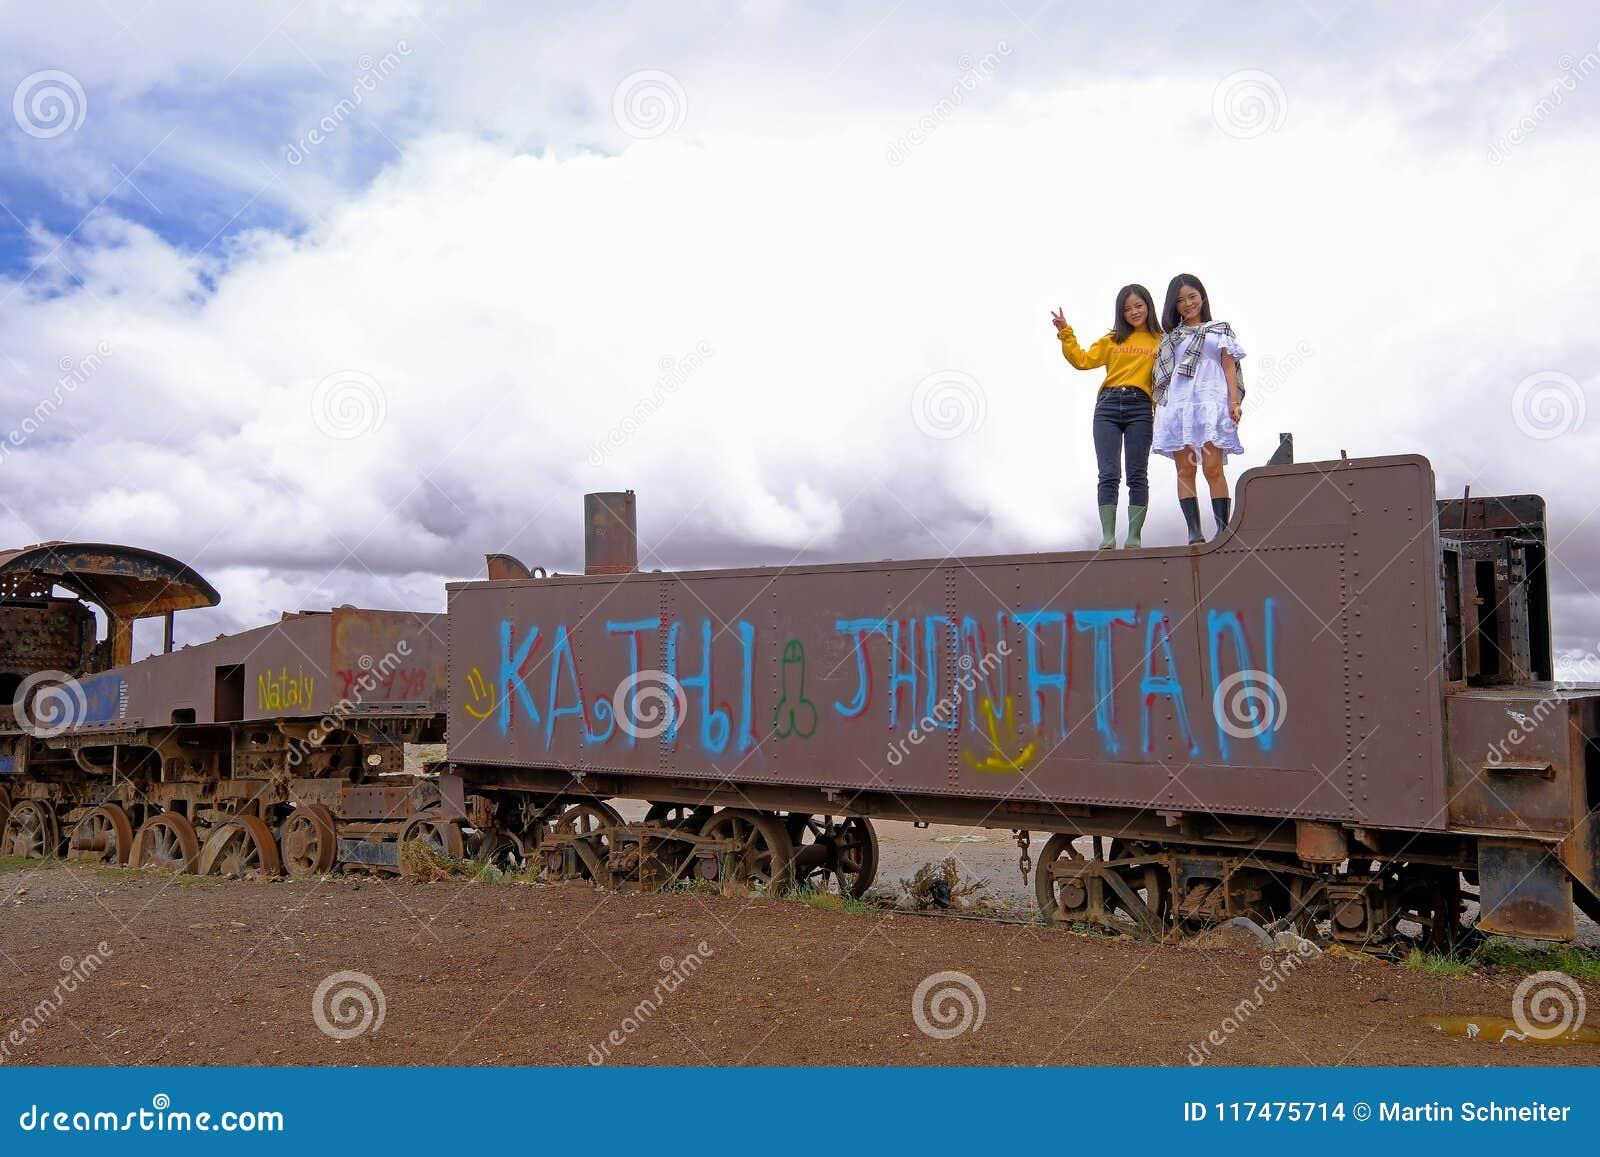 Uyuni, Bolivia, January 31, 2018: Two chinese tourists standing on a rusty train at the train graveyard, mass tourism